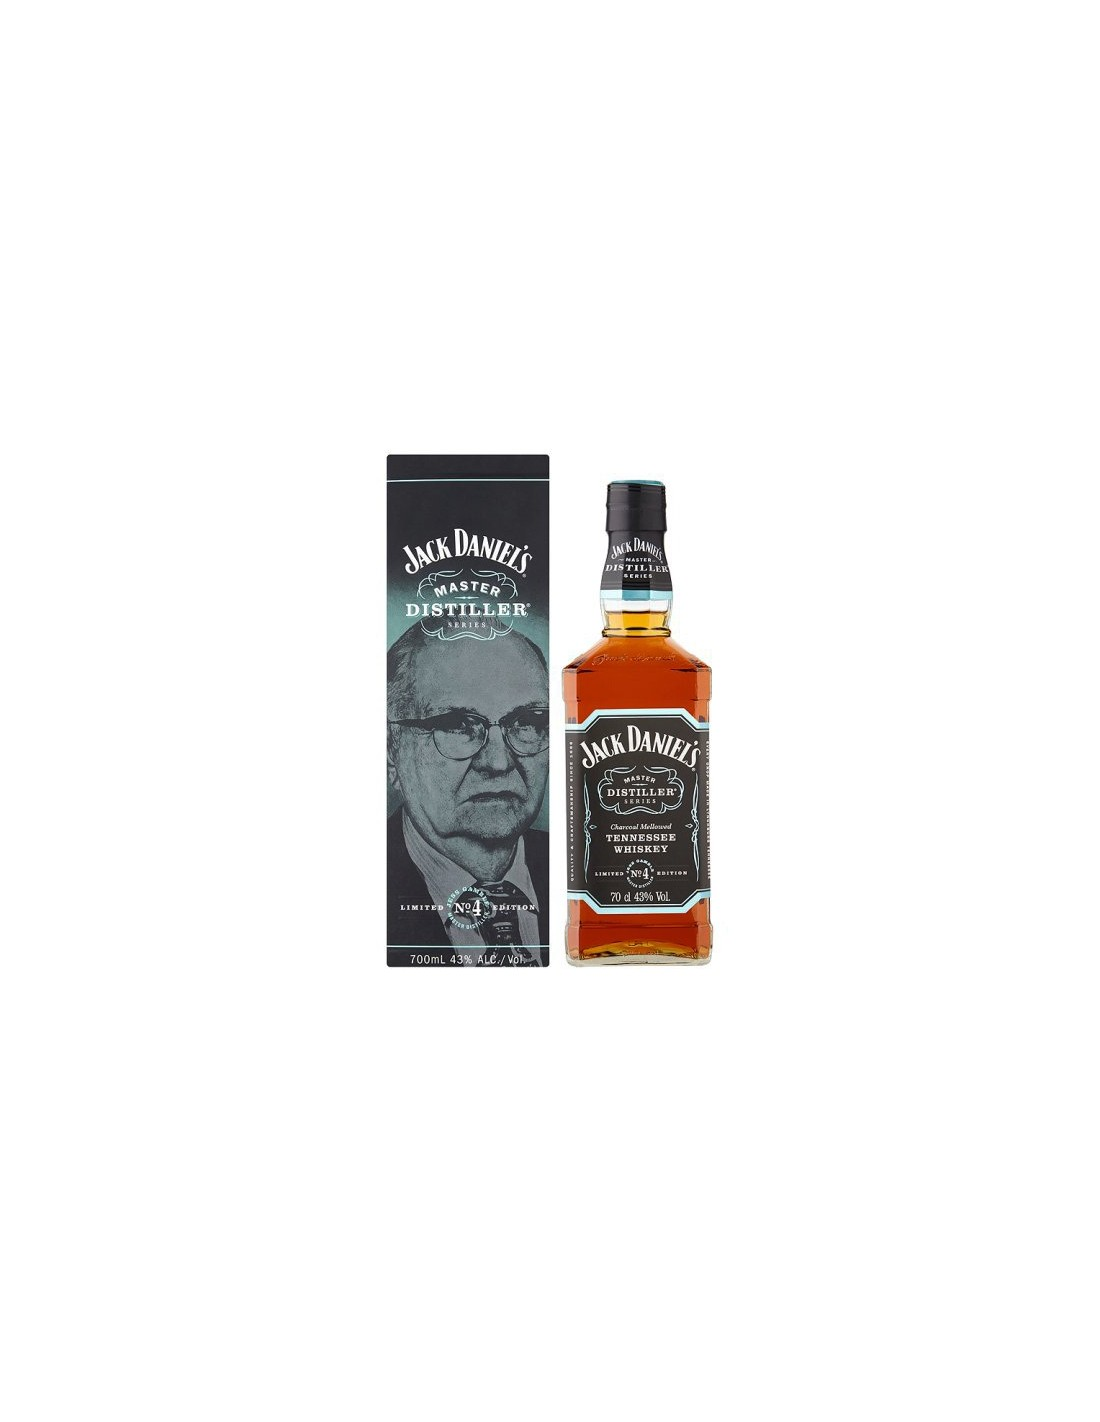 Whisky Bourbon Jack Daniel's Master Distiller No. 4, 43% alc., 0.7L, America